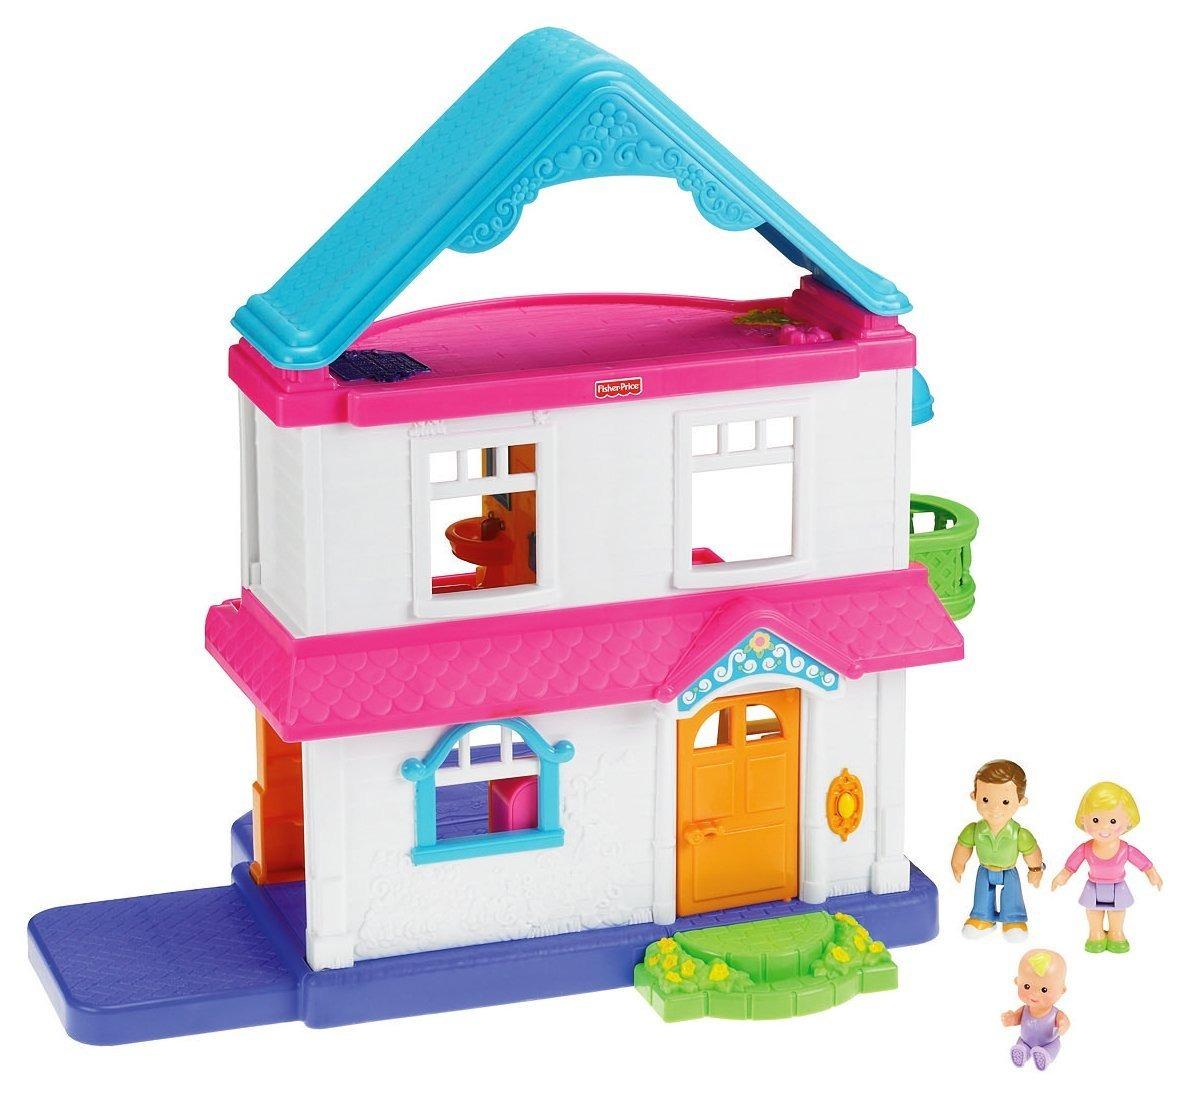 Casa casita de mu ecas para ni as juego fisher price mn4 - Casitas de juguete para ninas ...